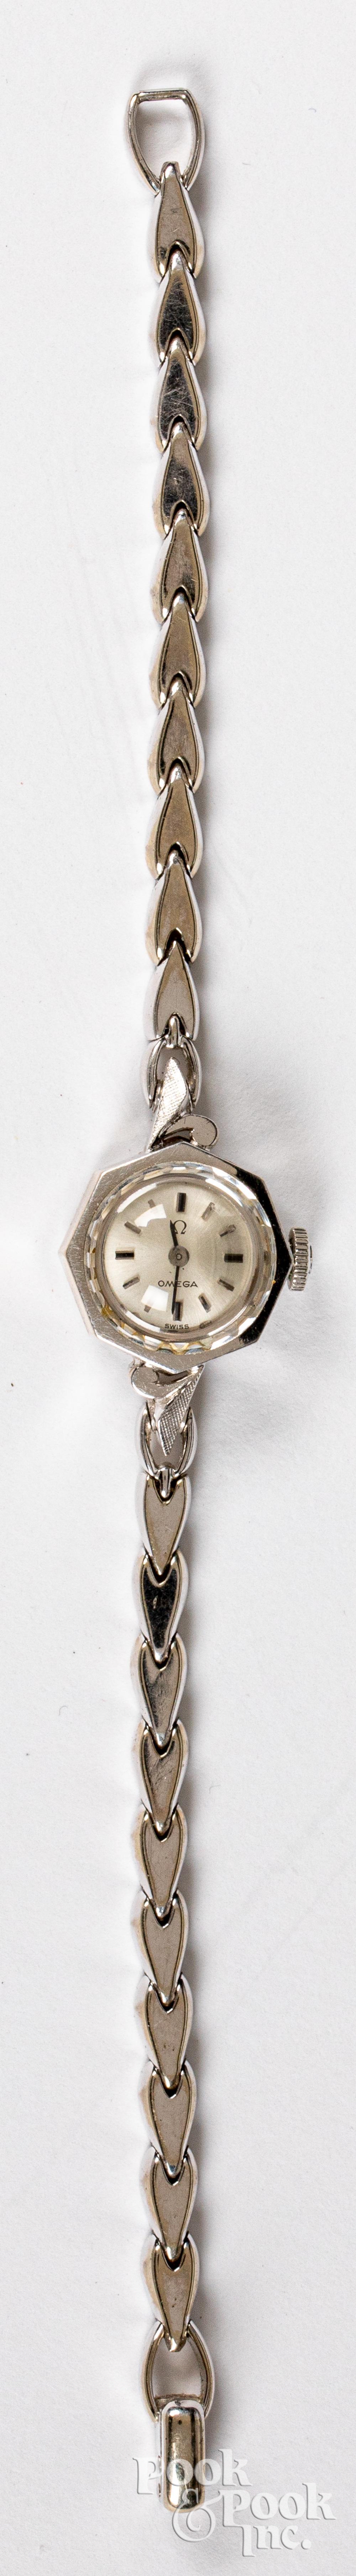 14K gold Omega ladies wristwatch, 8dwt.